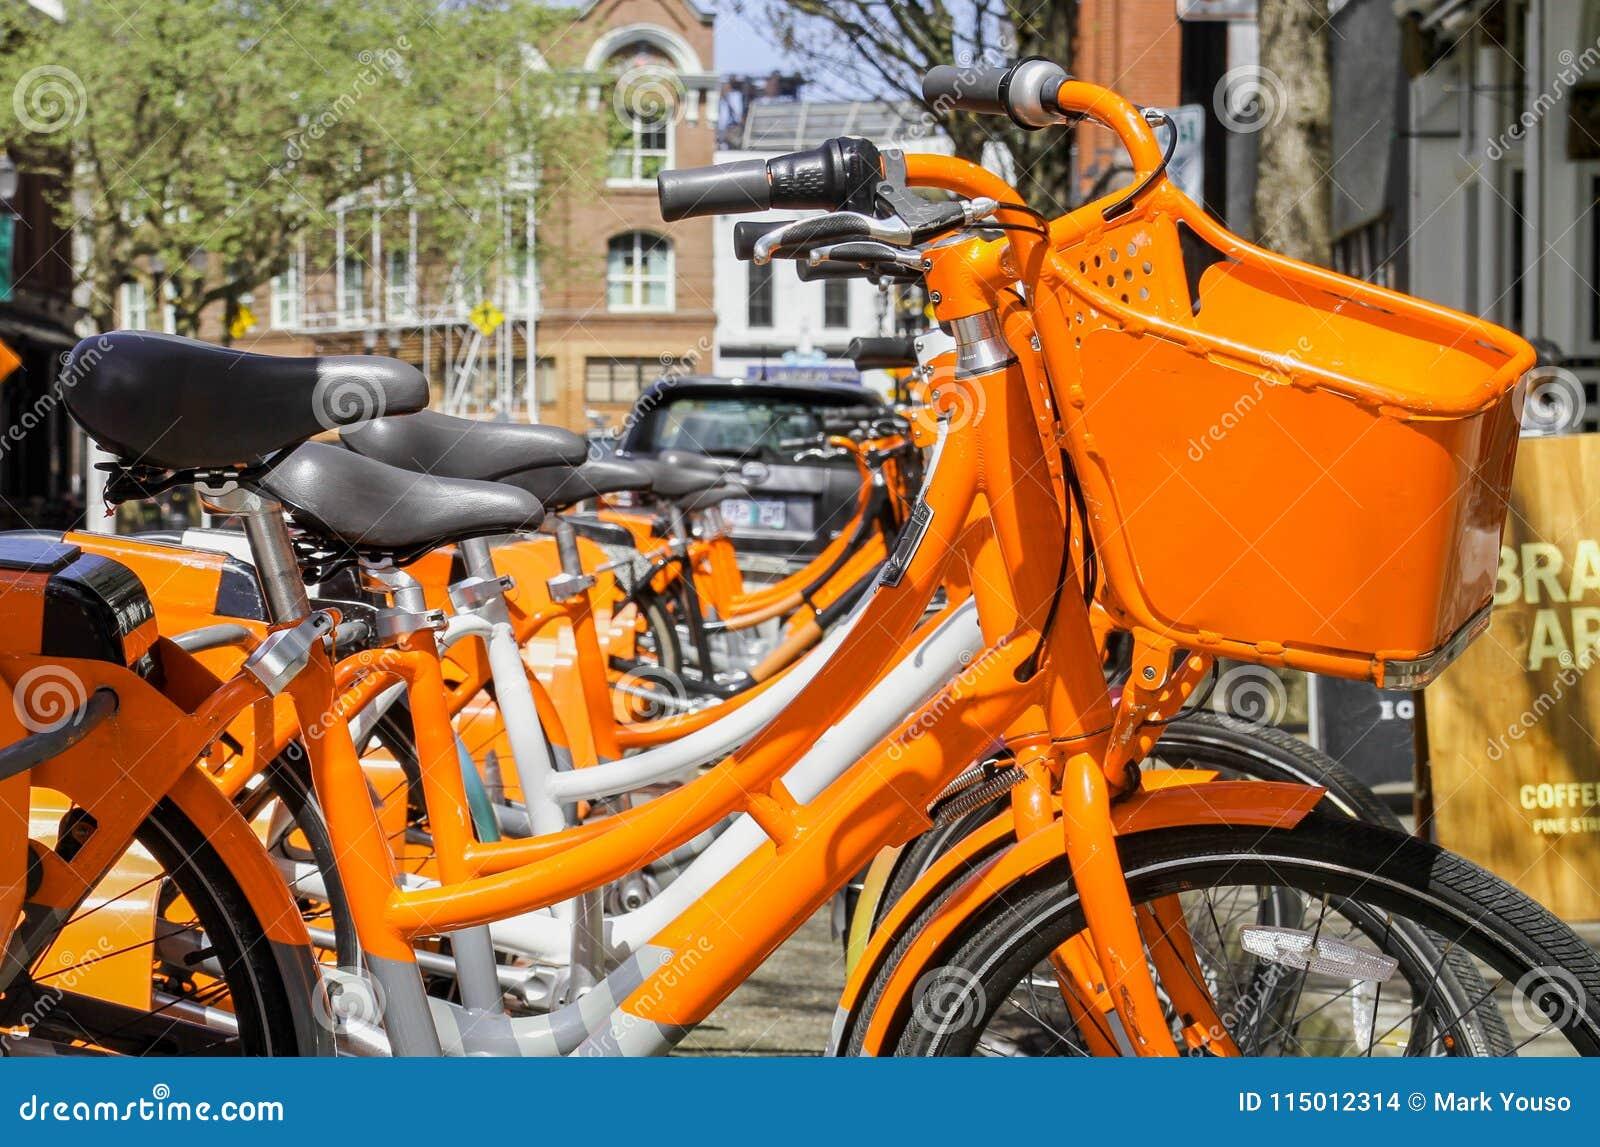 Orange Bicycle Rentals in the City